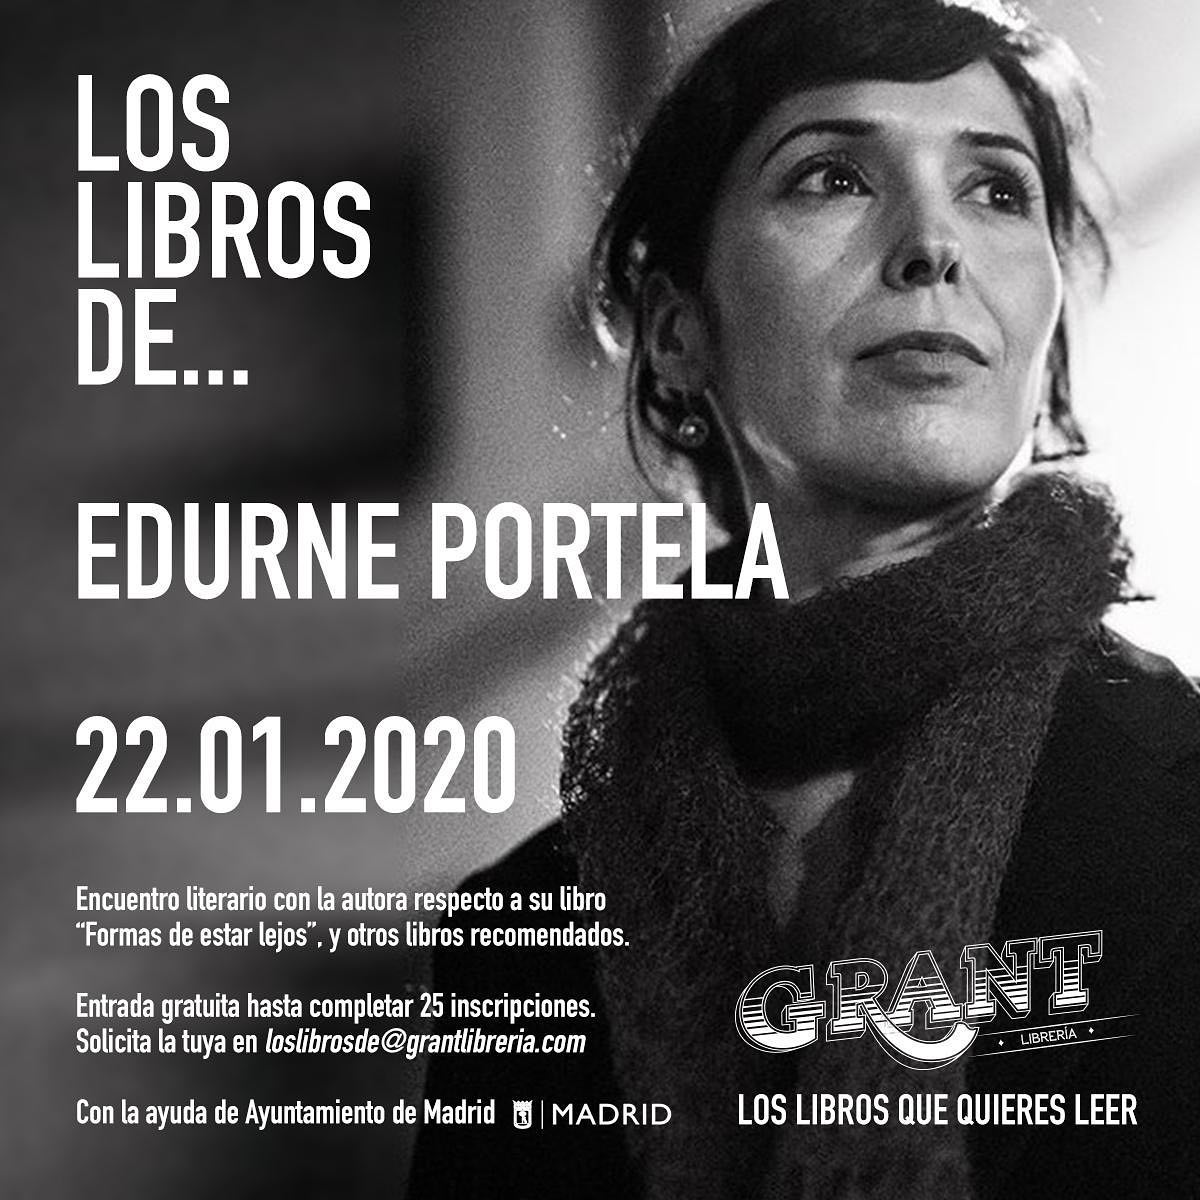 Grant Edurne Portela